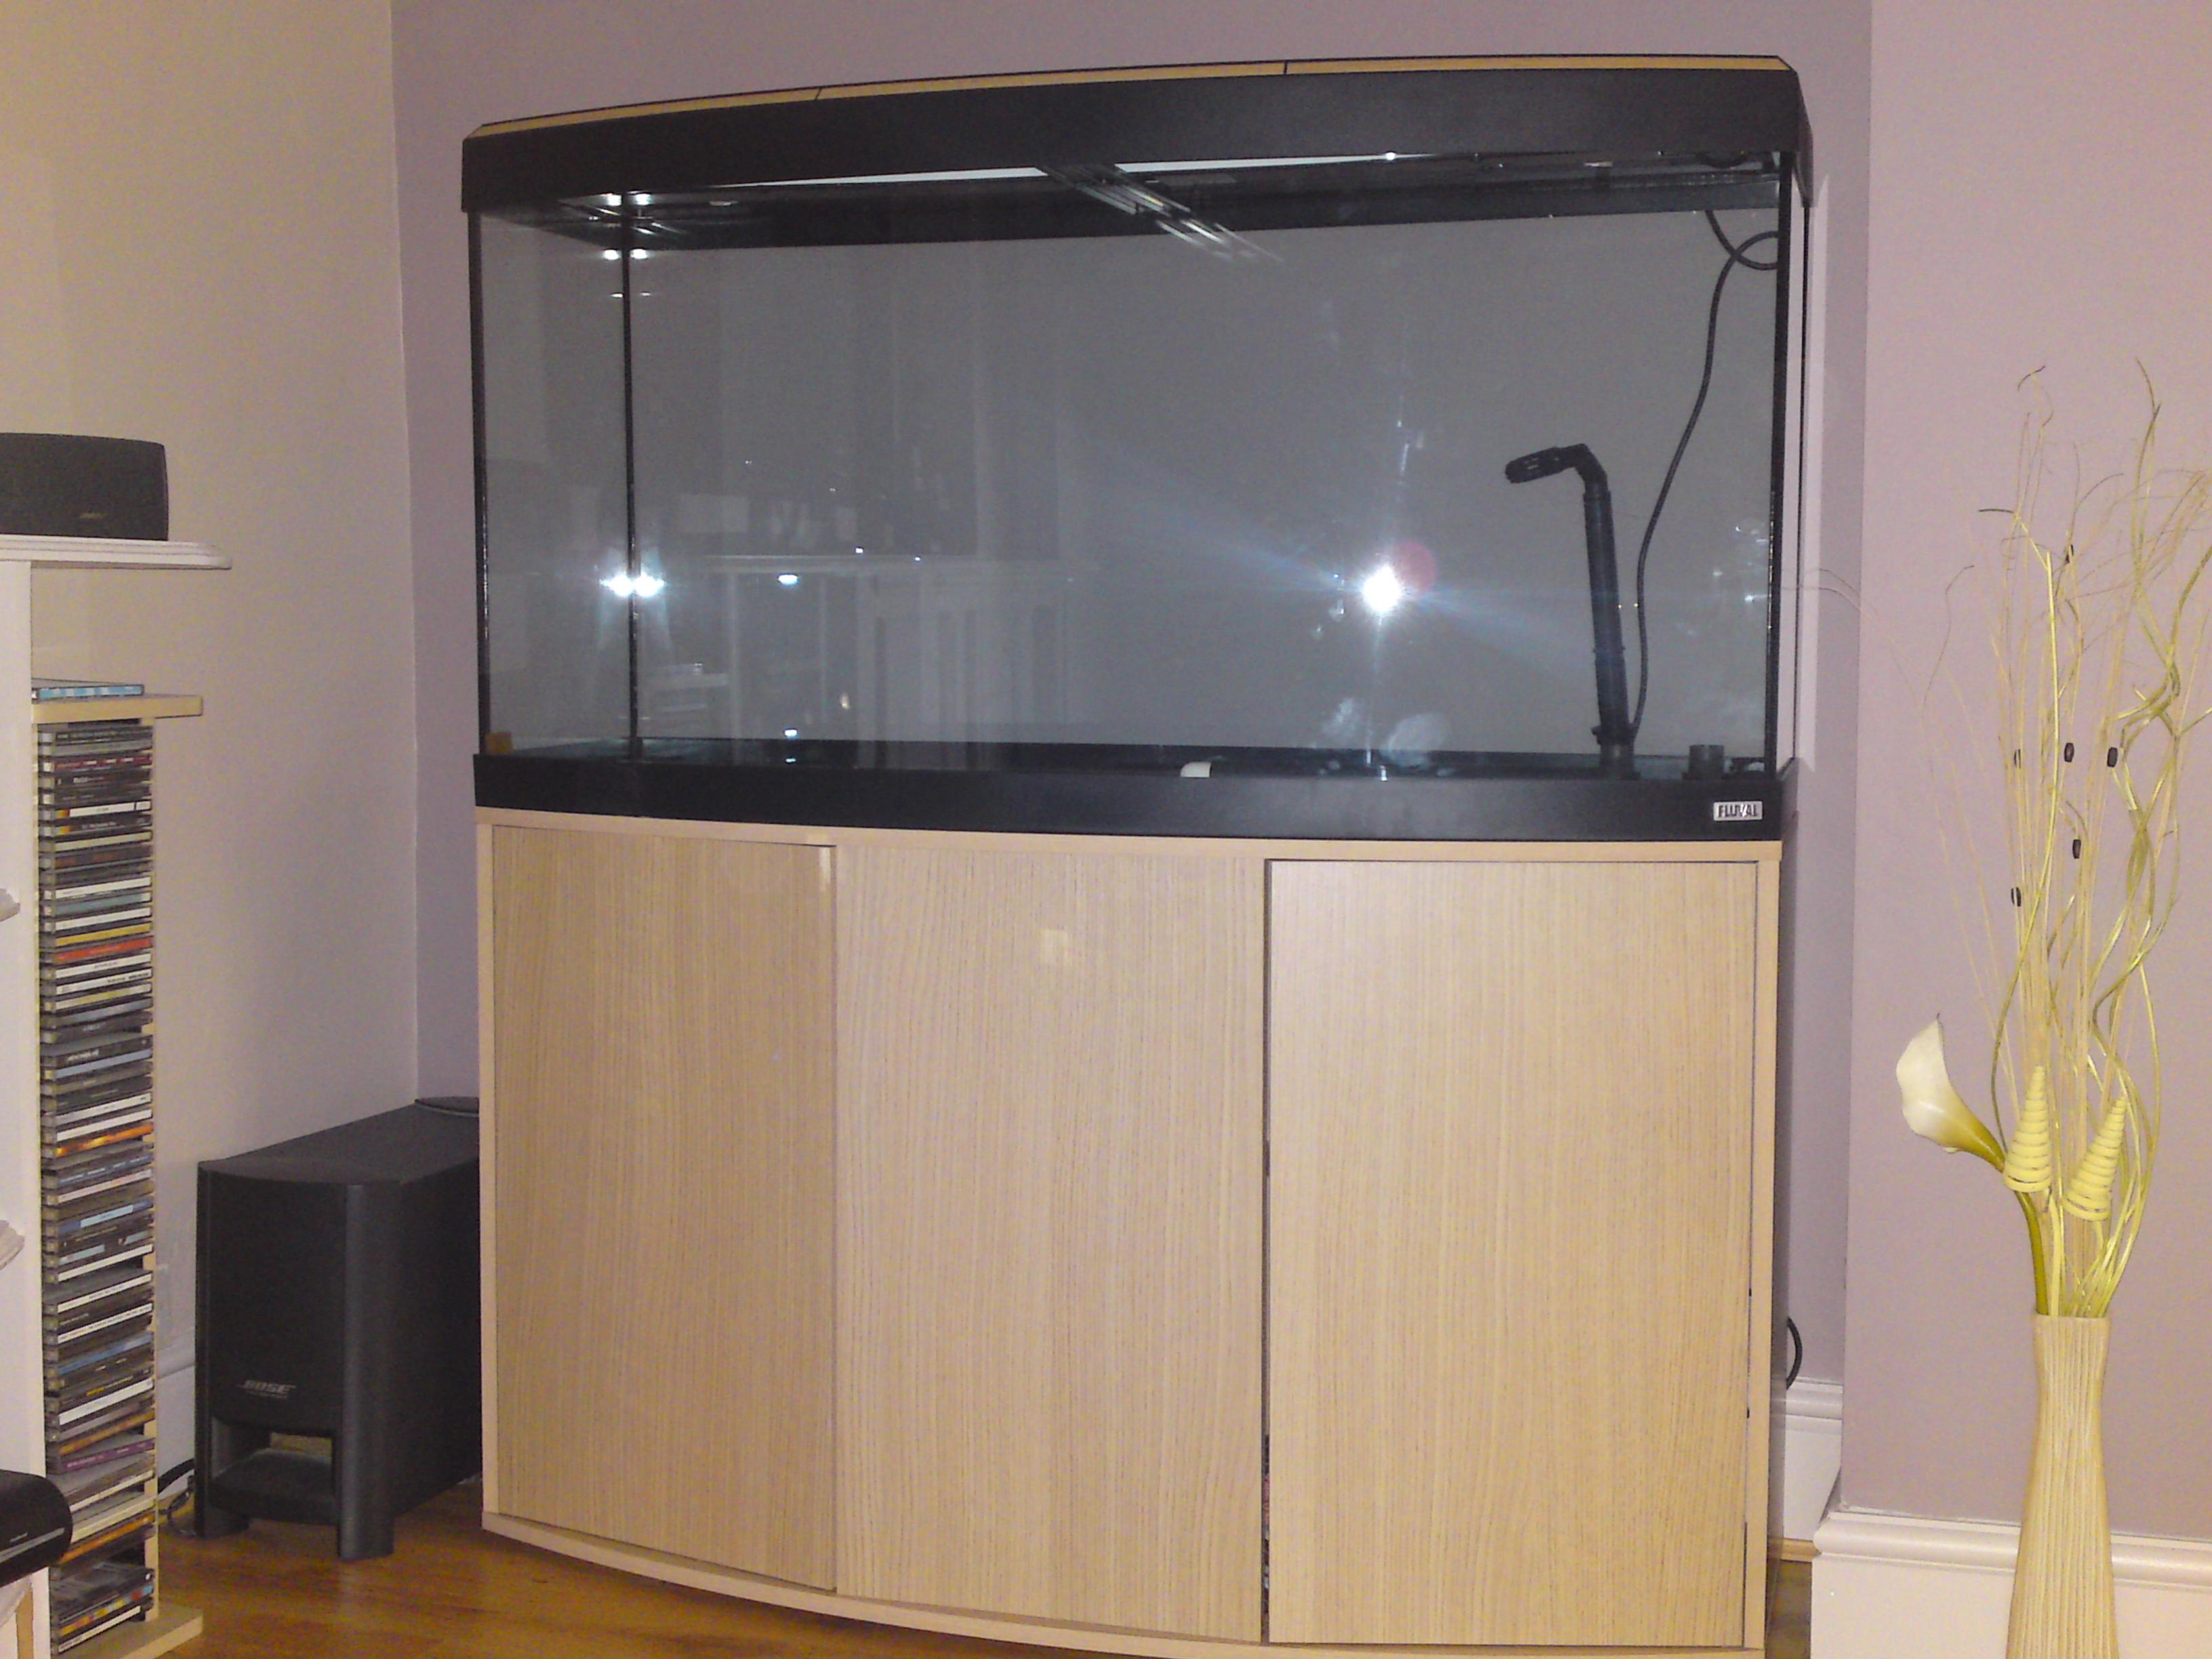 tank examples fluval vicenza 260. Black Bedroom Furniture Sets. Home Design Ideas